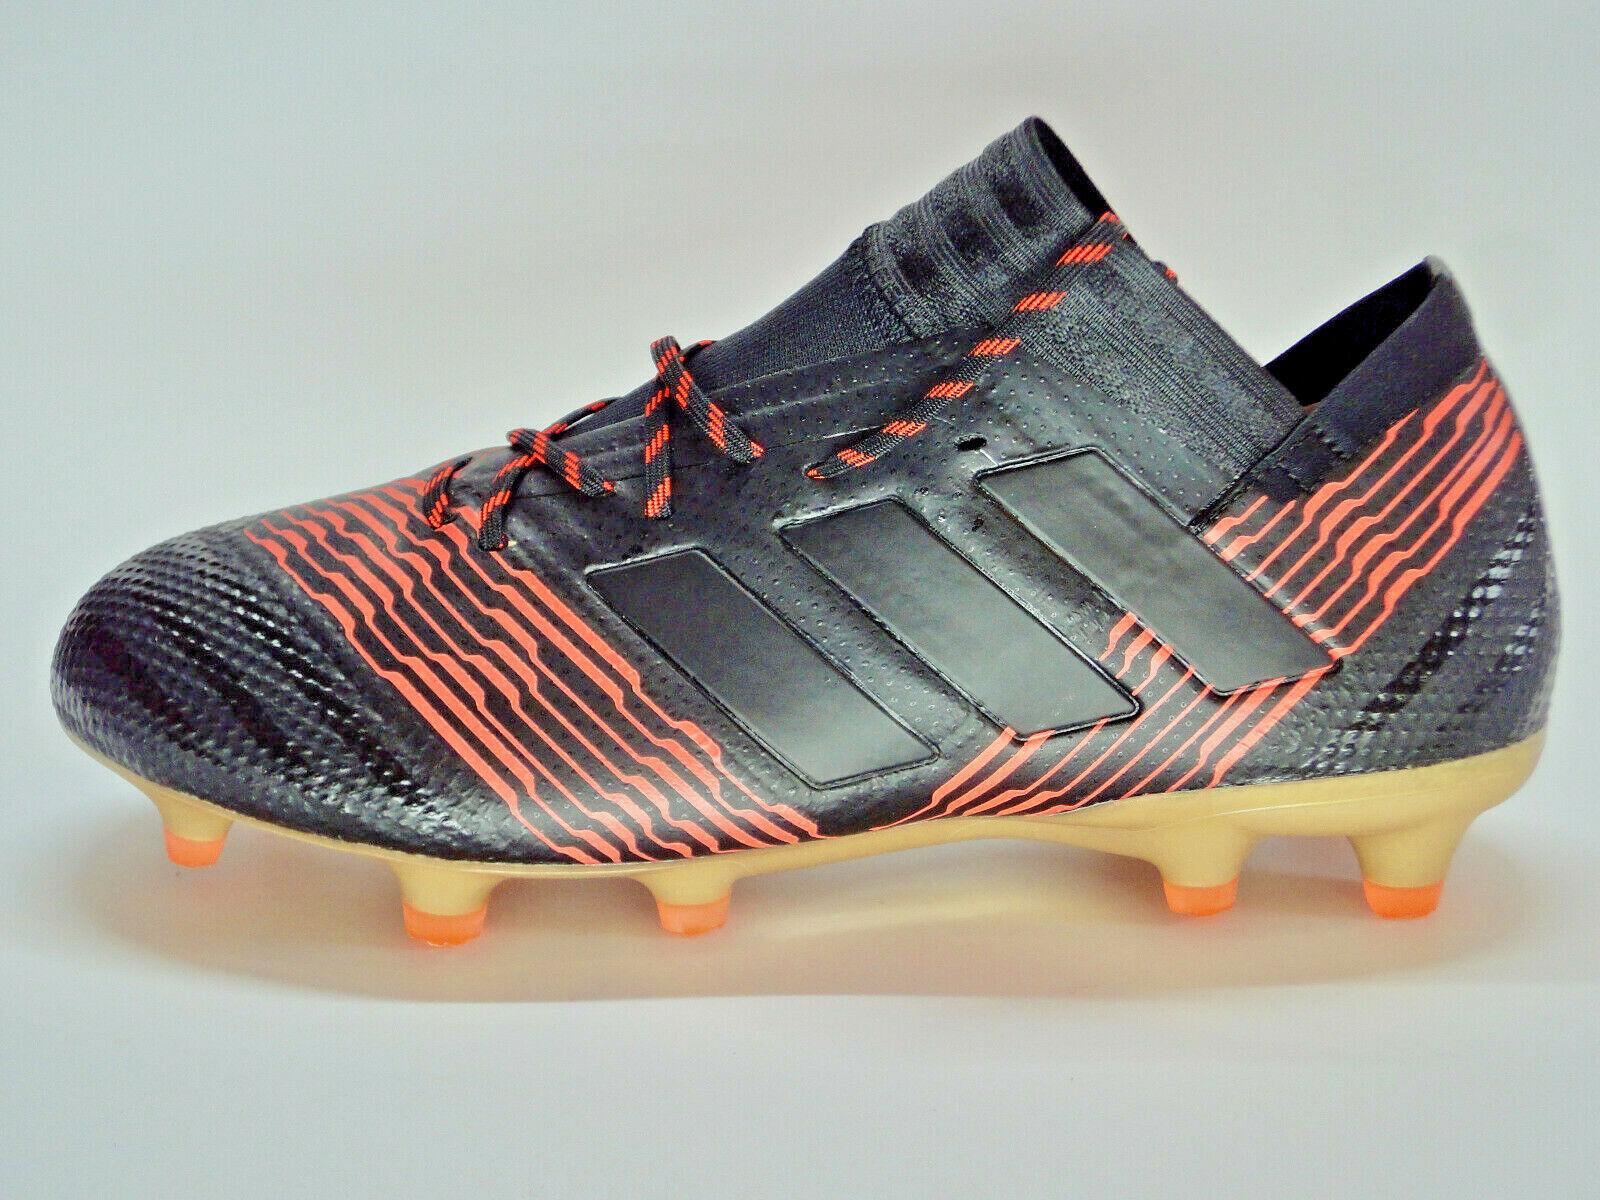 Adidas 17 Fussballschuhe Test Vergleich +++ Adidas 17